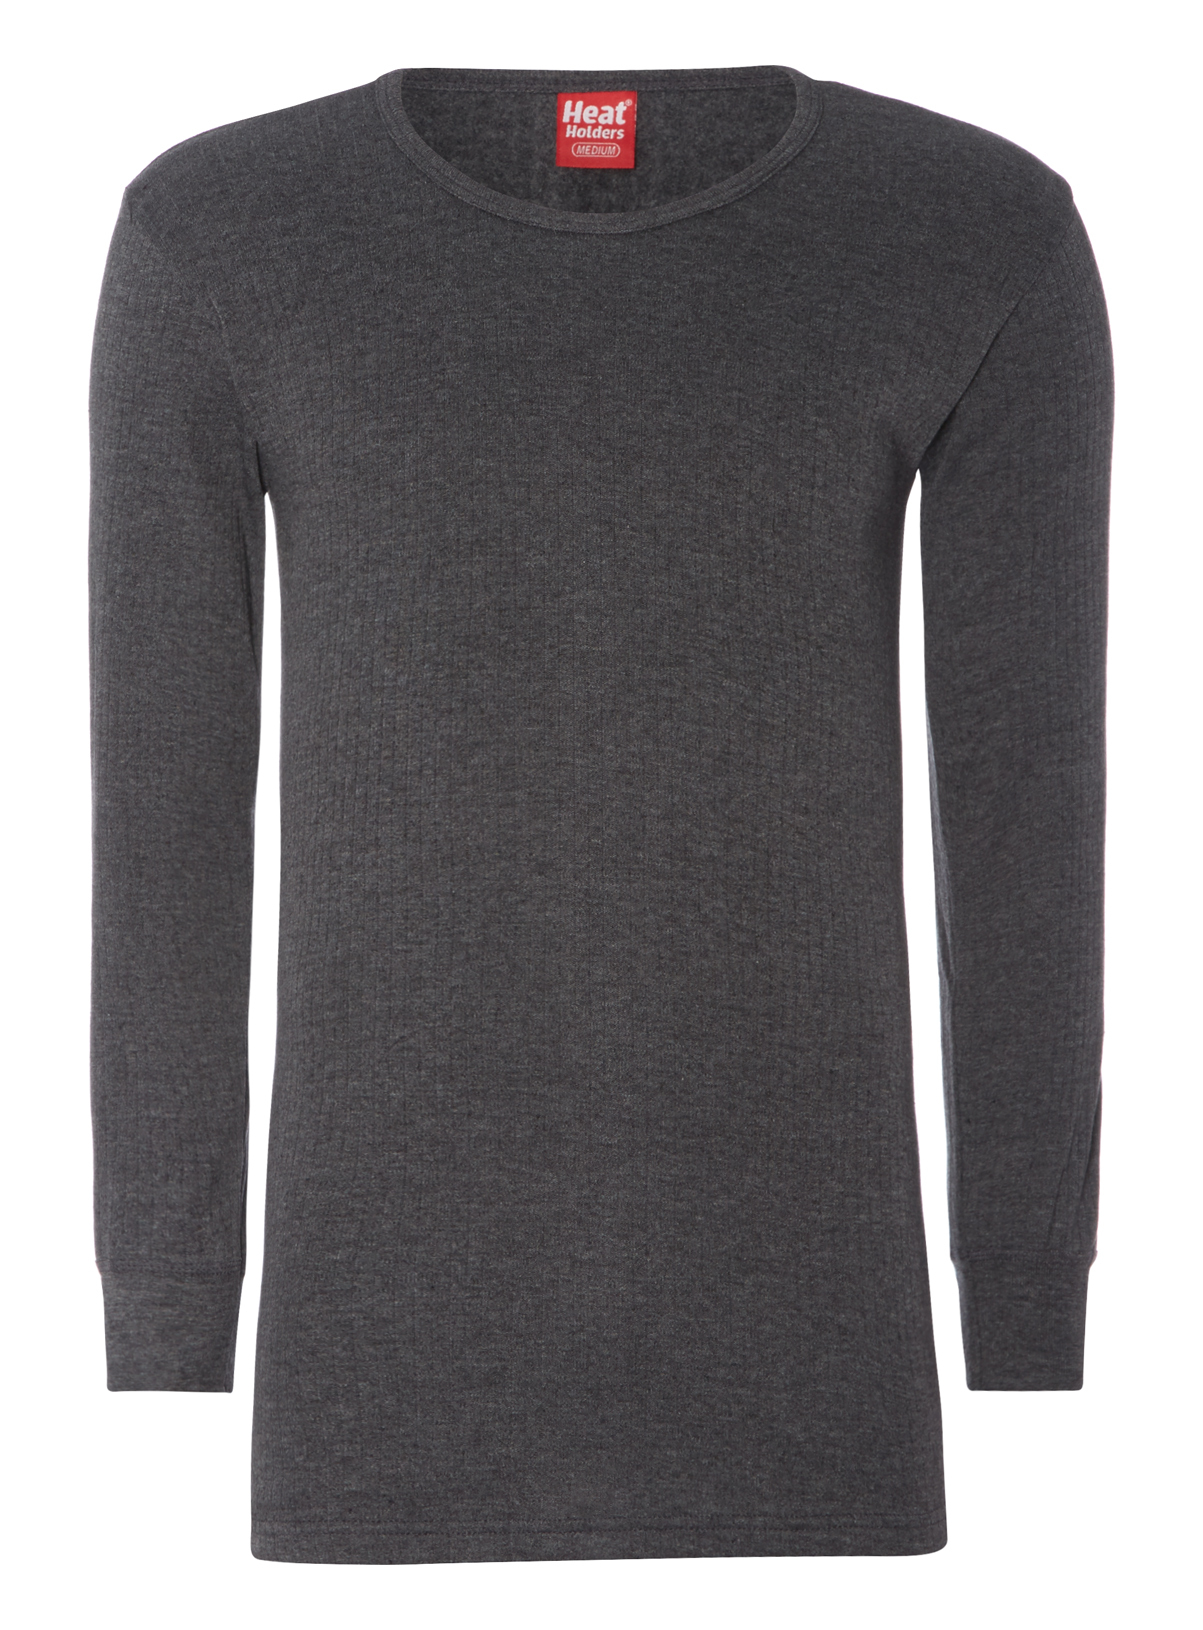 Mens Charcoal Heat Holders Thermal Top | Tu clothing